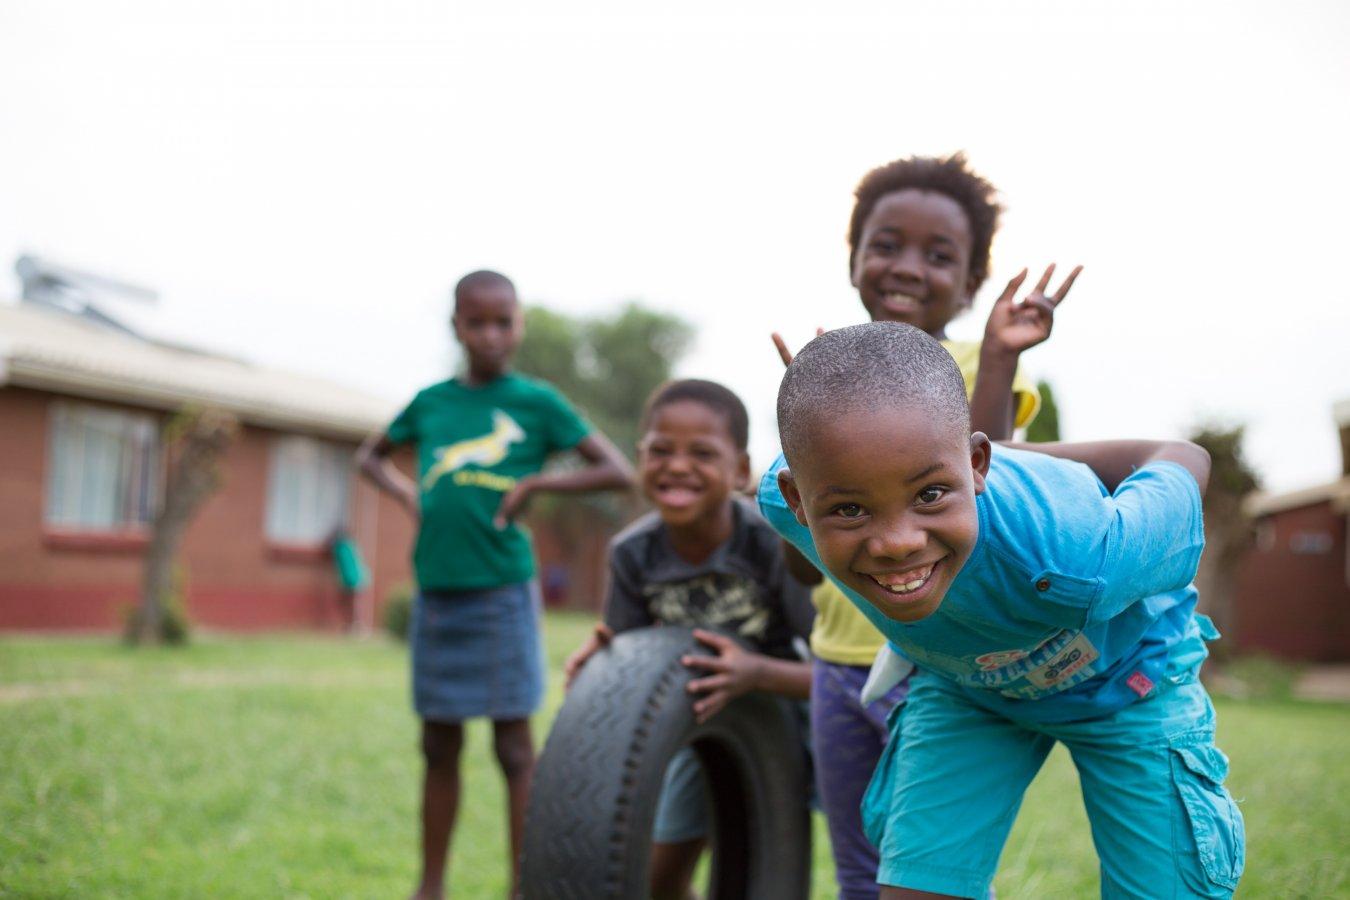 Kinderen in ons kinderdorp in Mamelodi, Zuid-Afrika